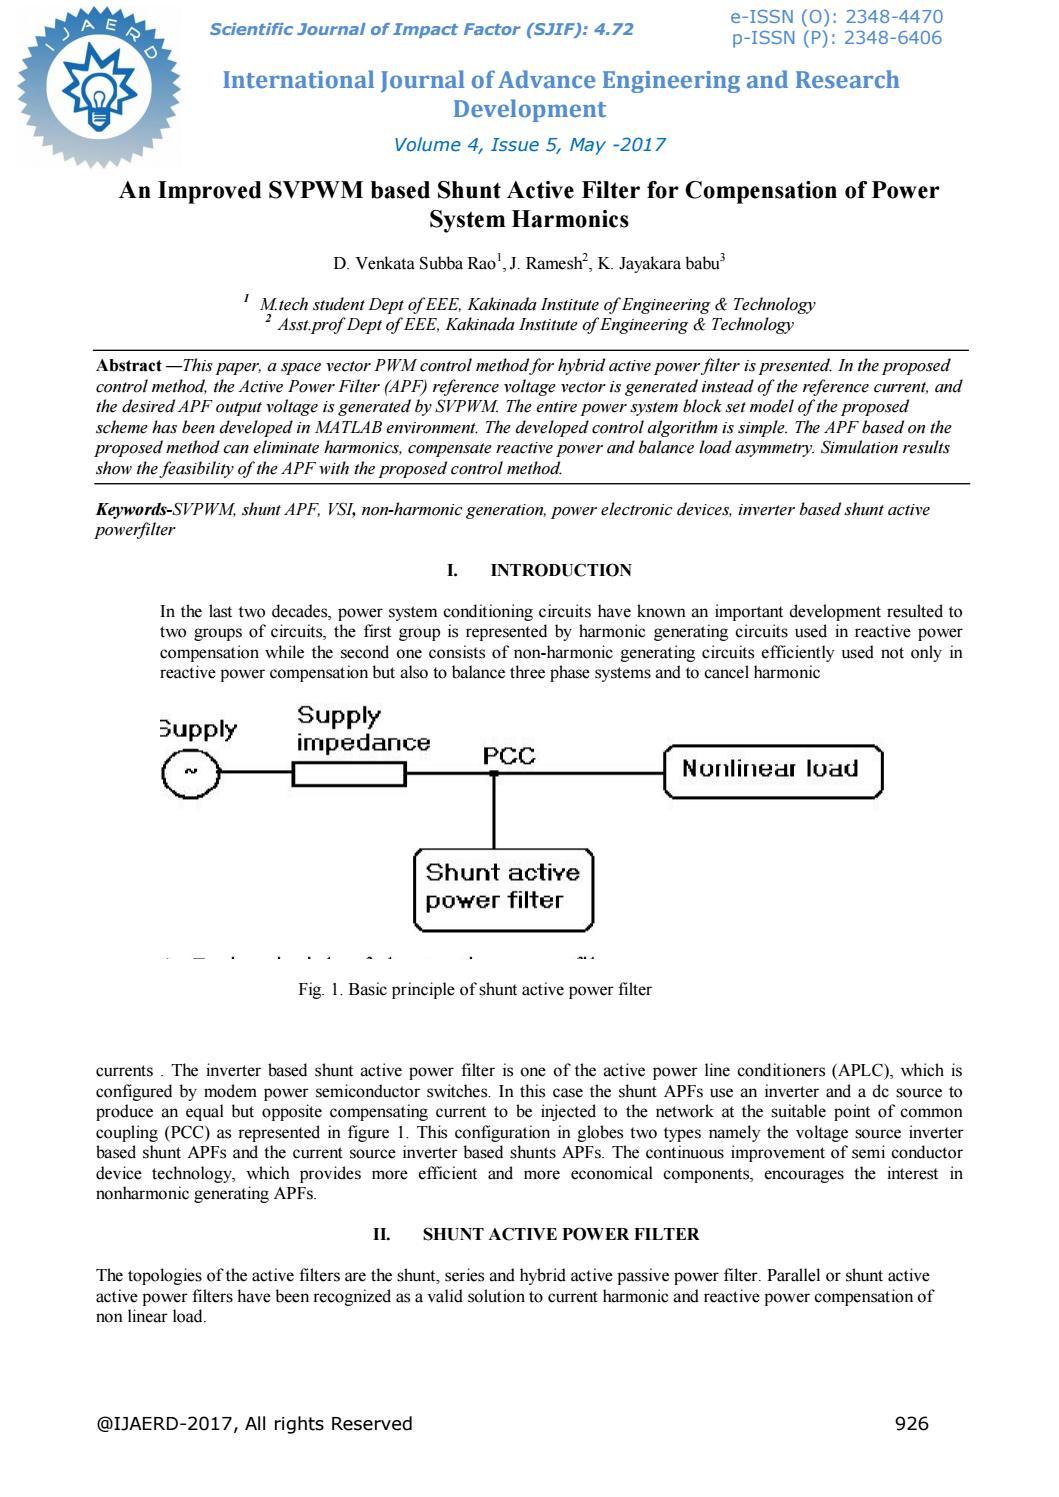 An Improved Svpwm Based Shunt Active Filter For Compensation Of Circuit Power System Harmonics Ijaerdv04i051 By Editor Ijaerd Issuu